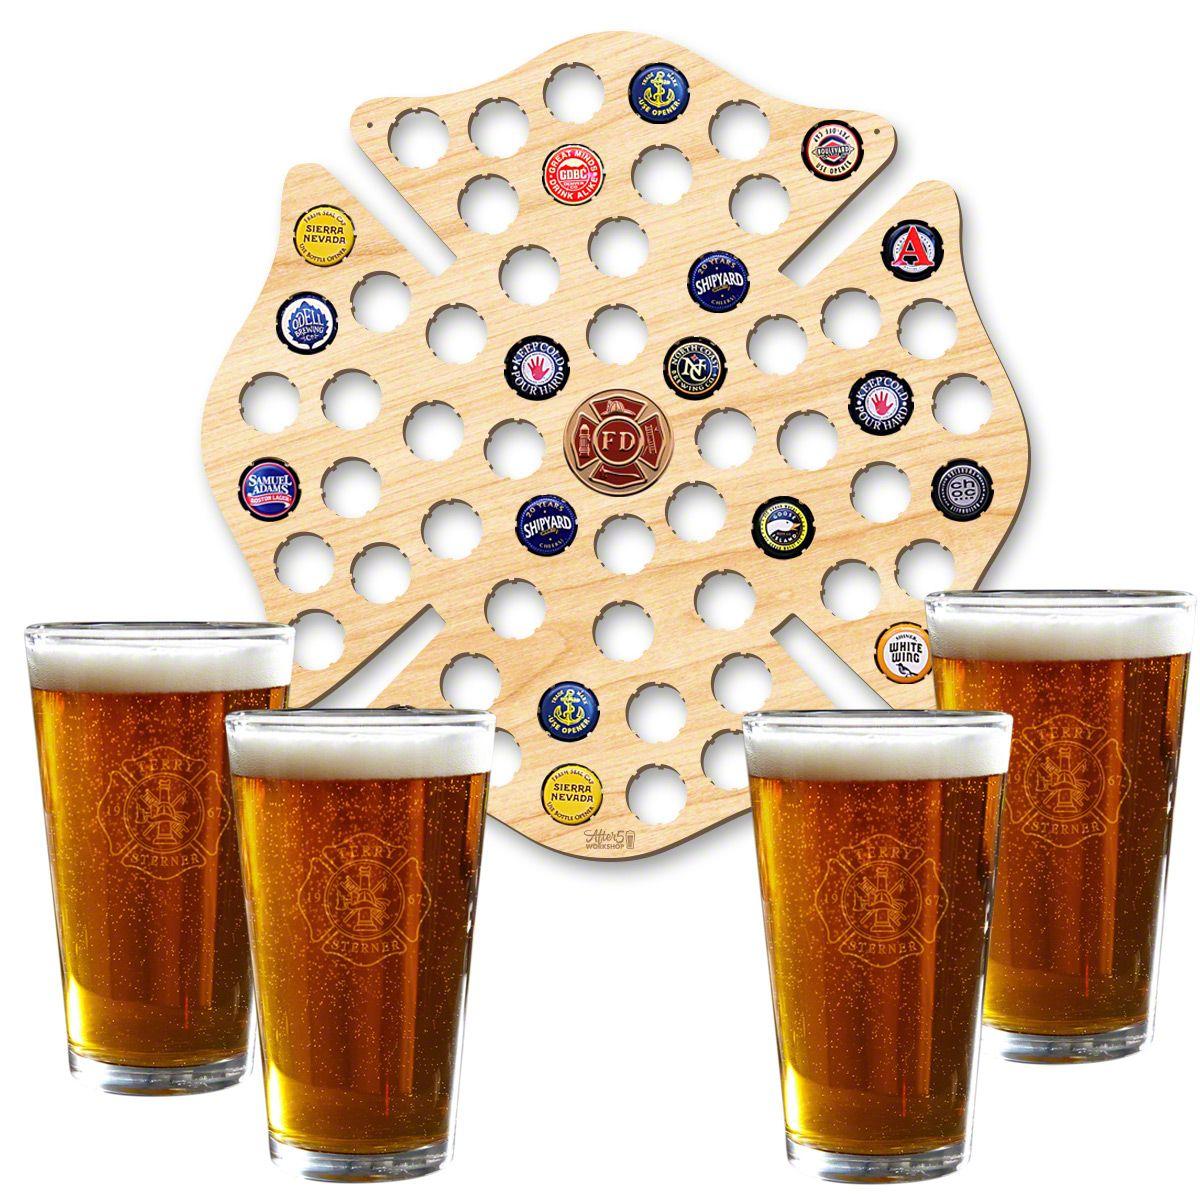 Custom Maltese Cross Beer Cap Map and Beer Glasses